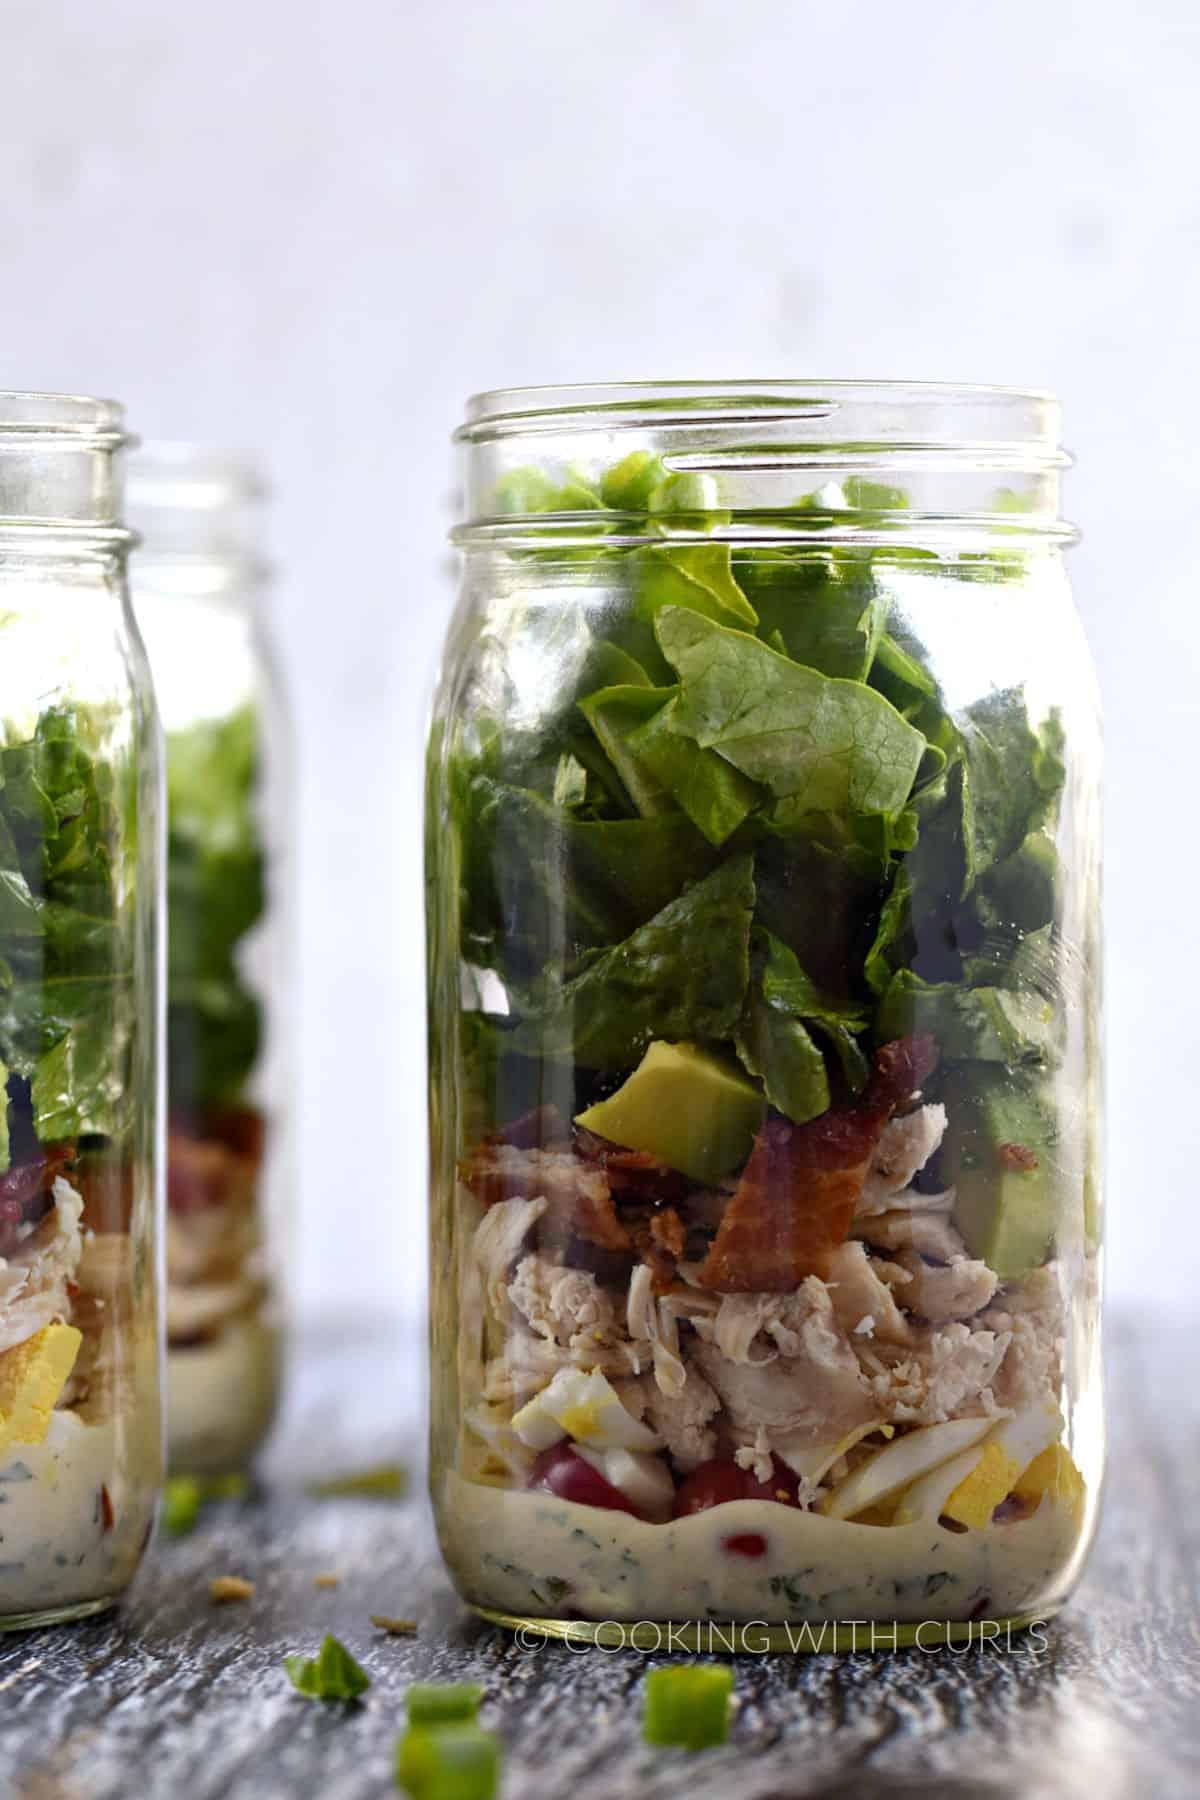 Ranch dressing, tomato, egg, bacon, avocado, and lettuce layered in a Mason jar.